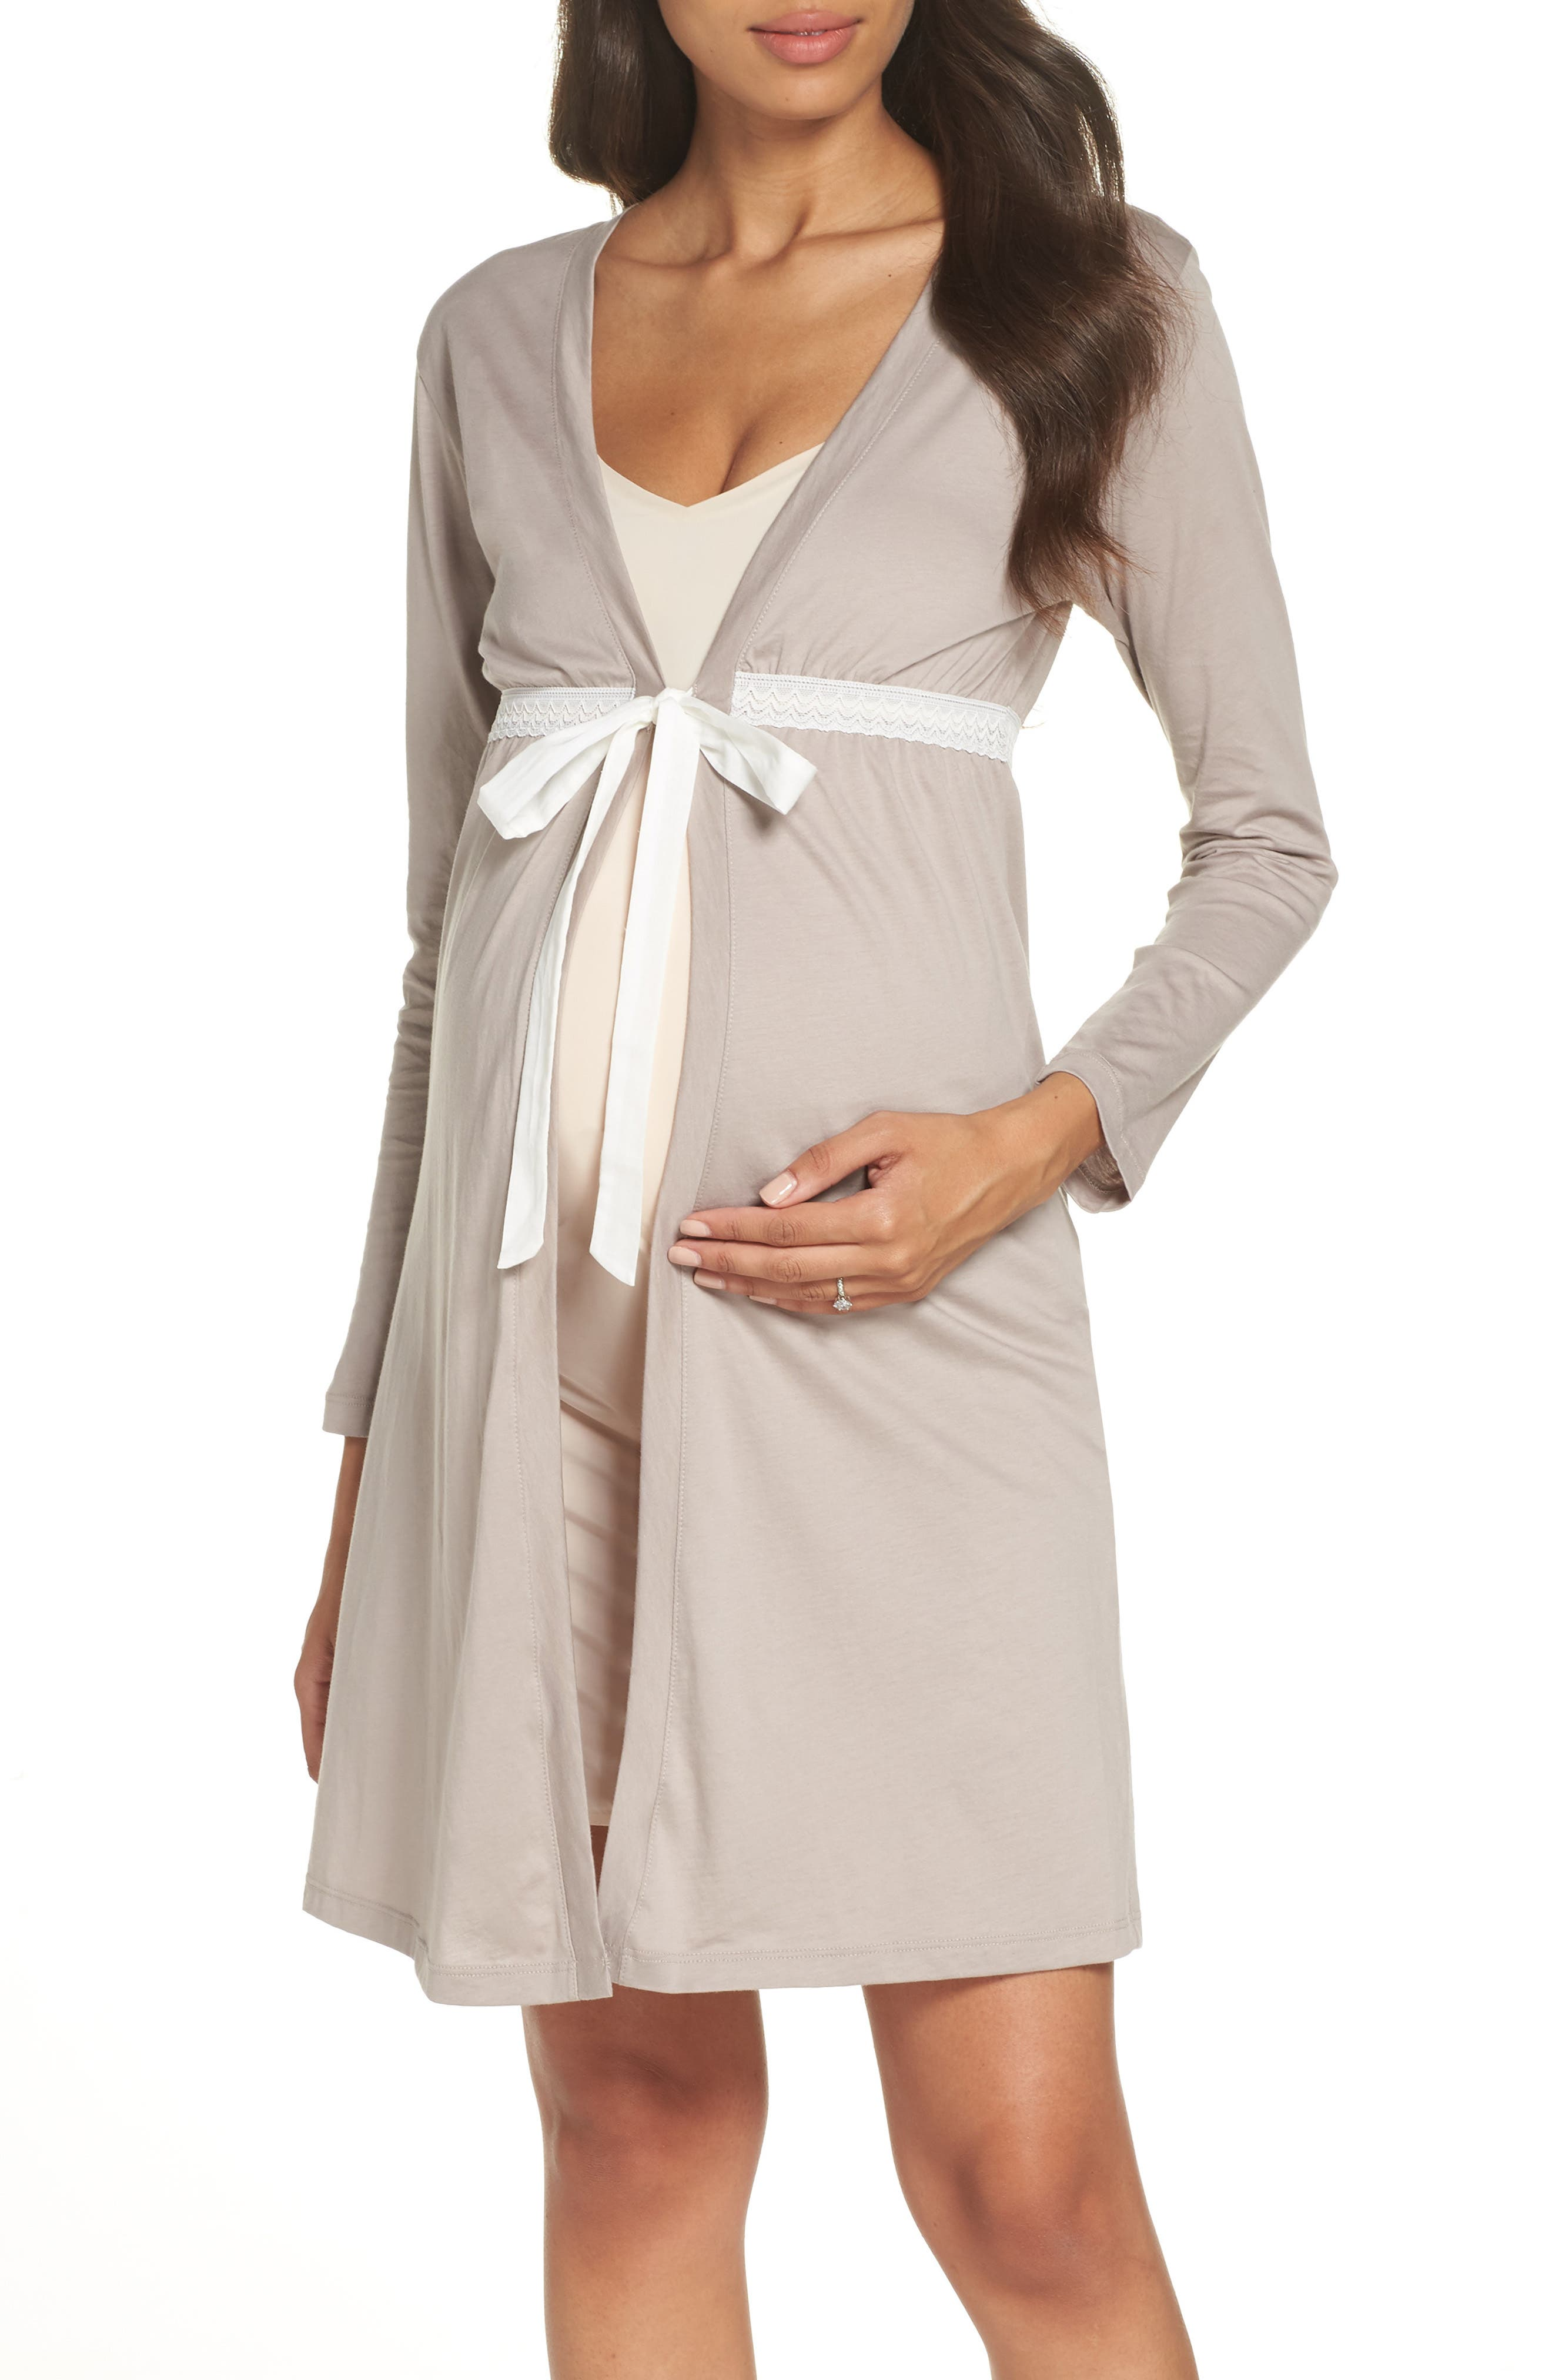 cf5ec88261c52 Grey BELABUMBUM Maternity/nursing Robe 8 - 10 (M) on COOLS